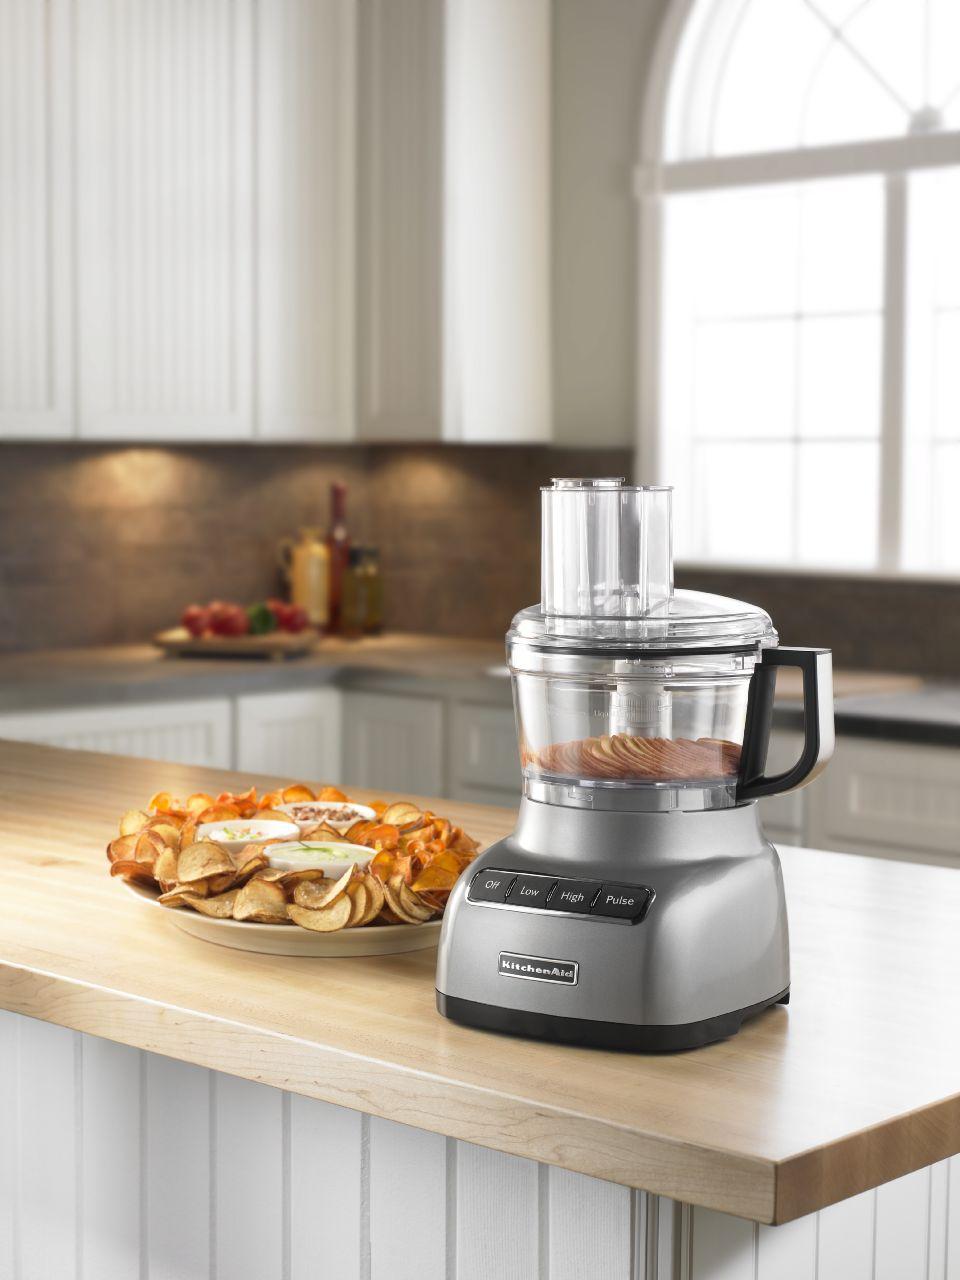 KitchenAid-7-Cup-Food-Processor thumbnail 6